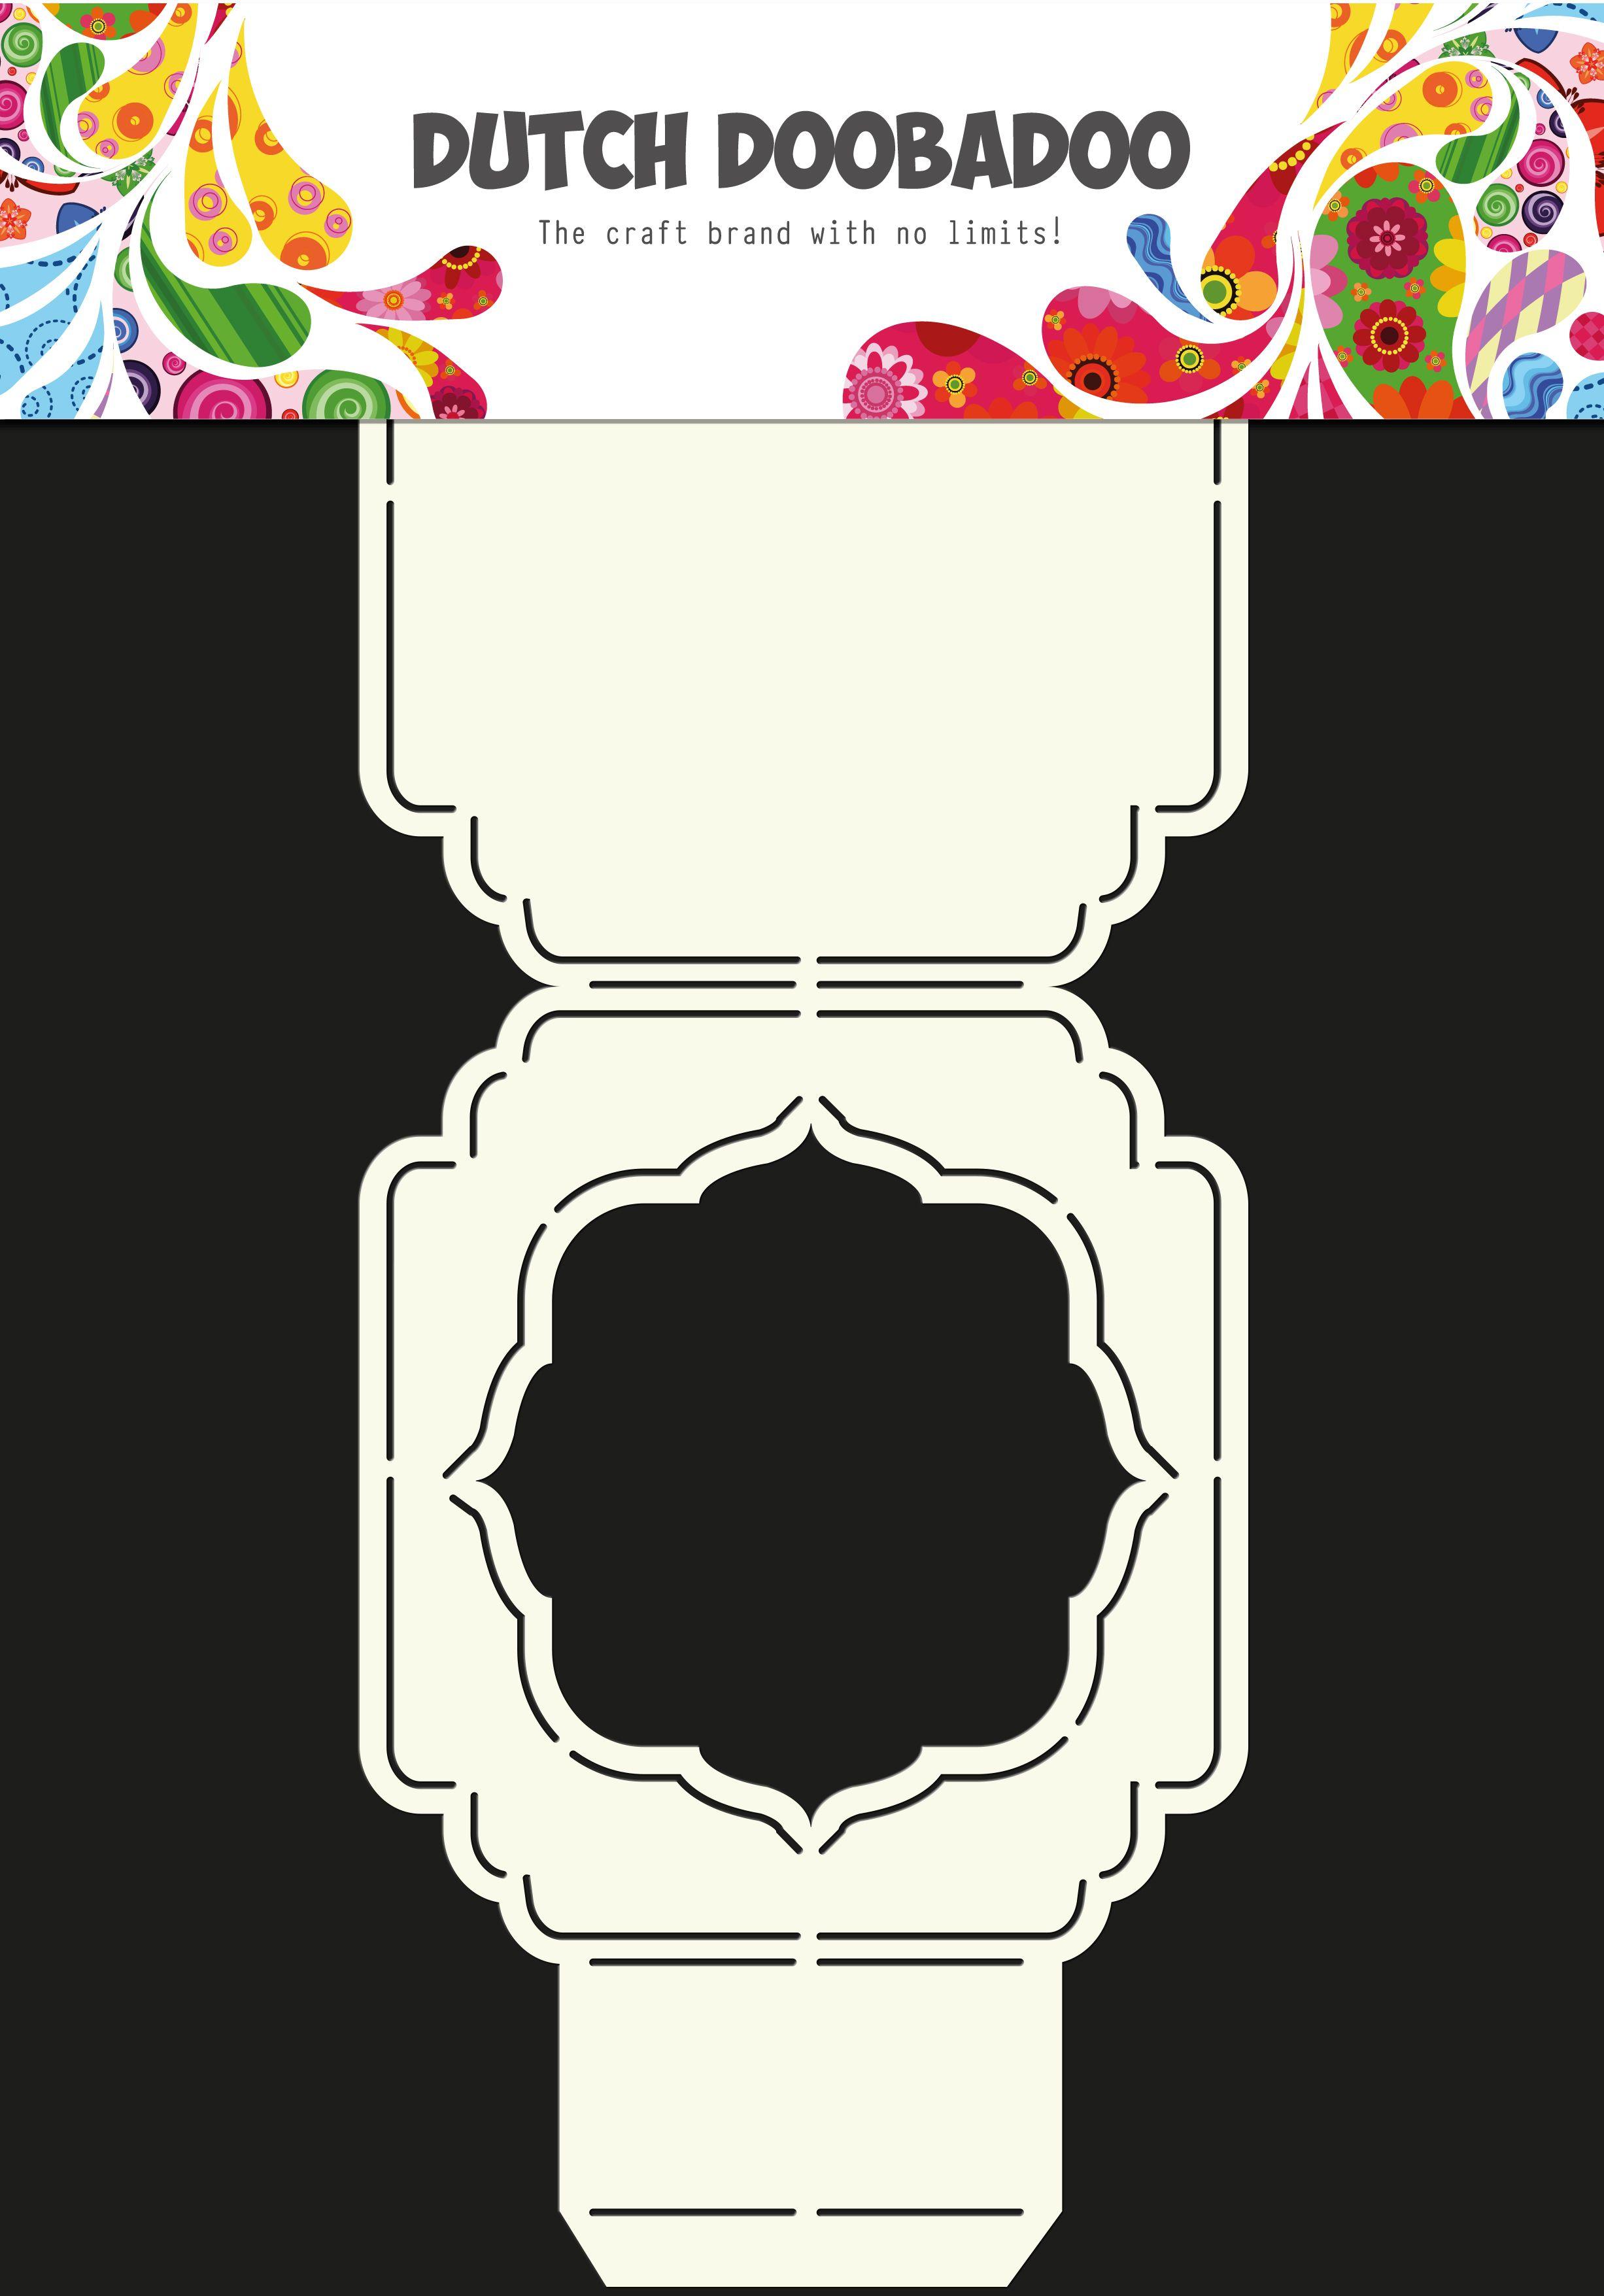 470.713.312 Dutch Doobadoo Card Art Tent  sc 1 st  Pinterest & 470.713.312 Dutch Doobadoo Card Art Tent | Dutch Doobadoo ...